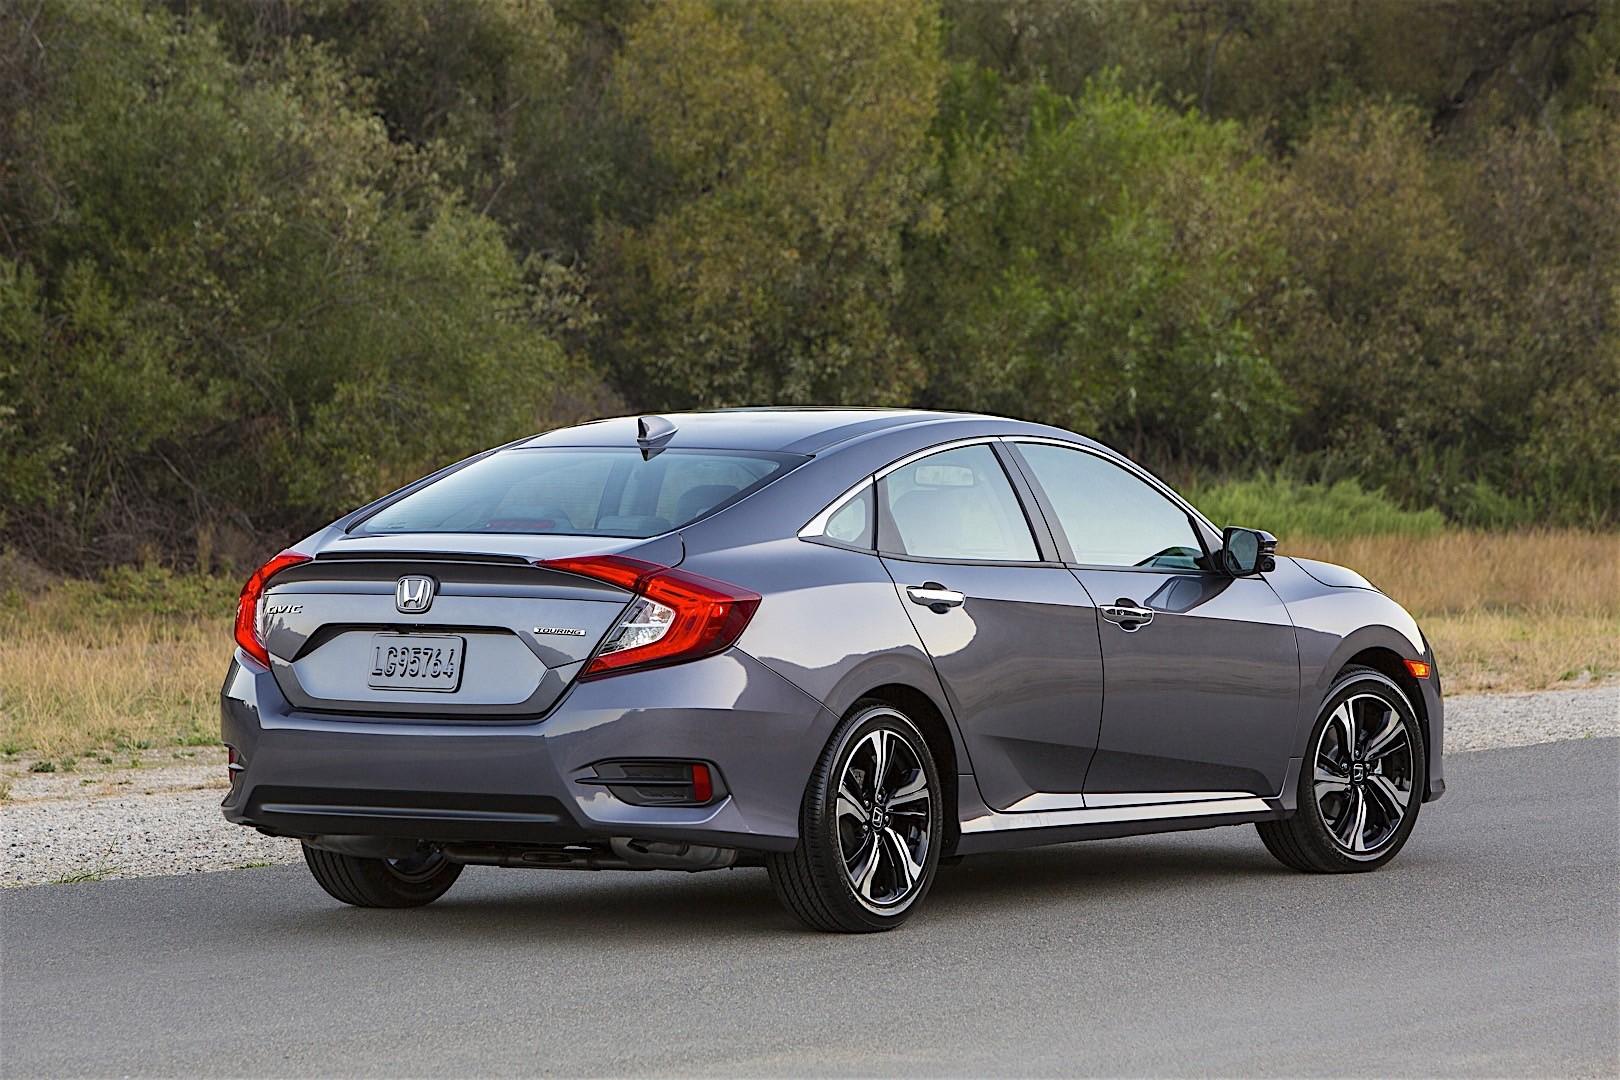 Honda civic sedan specs 2016 2017 2018 autoevolution for 2017 honda civic sedan dimensions